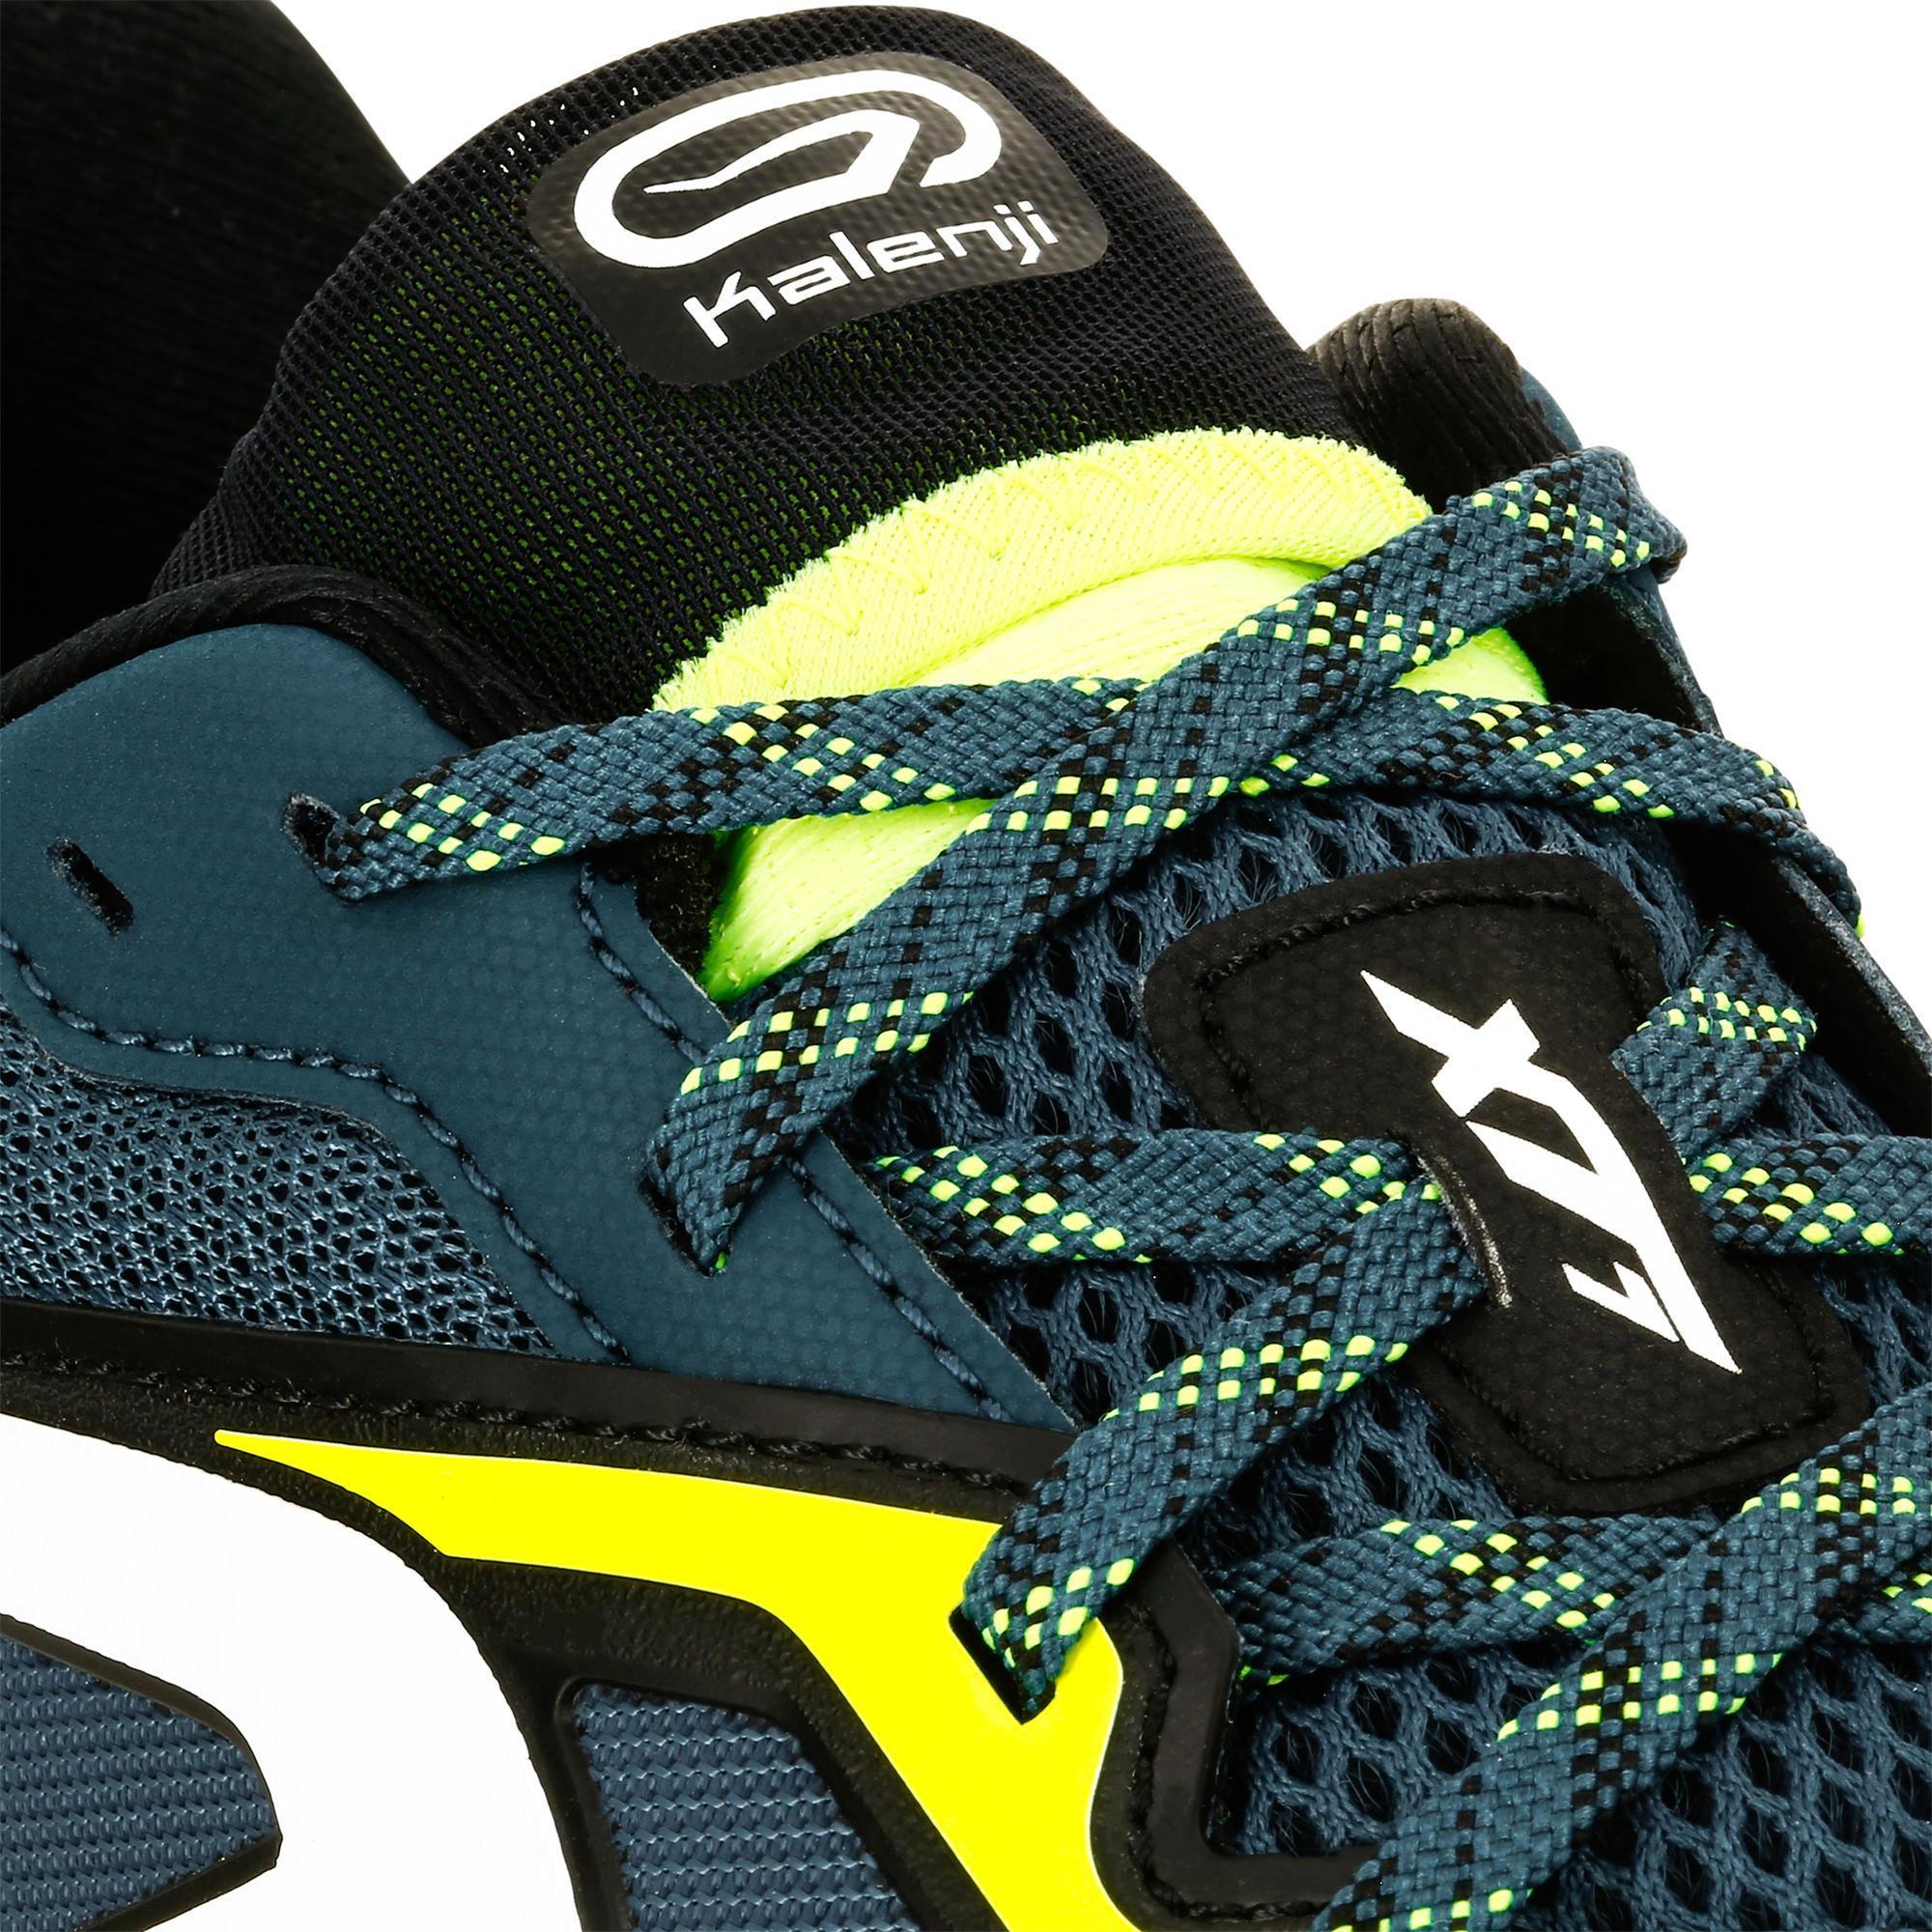 buy popular 8a451 dcd32 Kalenji Trail 7 Kiprun Xt Decathlon Chaussures Running Homme IwfI1q5